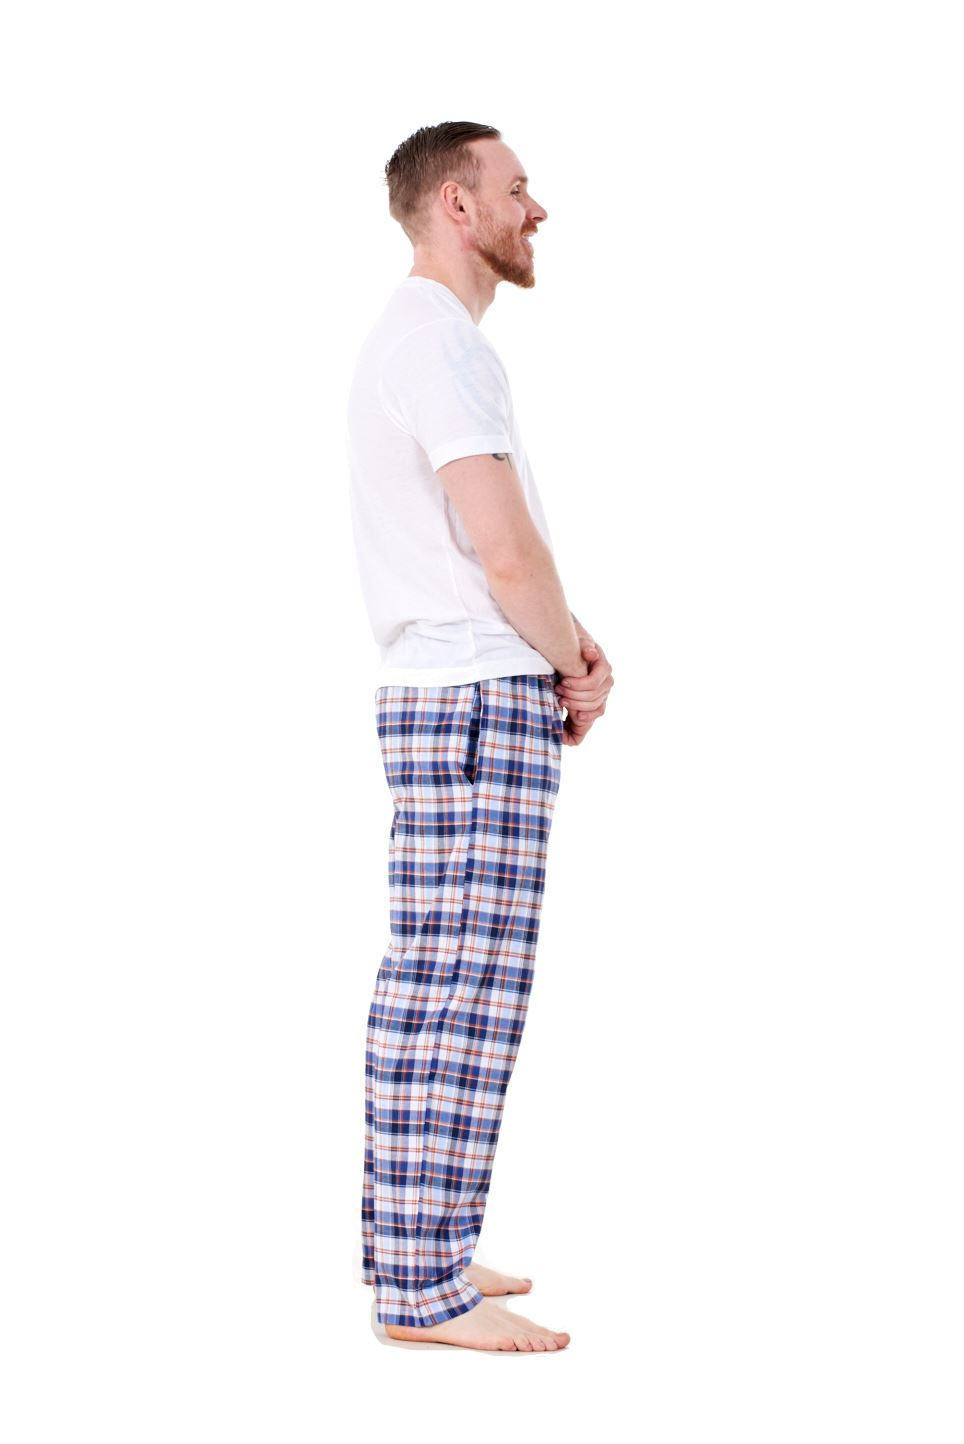 Mens-Pyjama-Bottoms-Rich-Cotton-Woven-Check-Lounge-Pant-Nightwear-Big-3XL-to-5XL Indexbild 17